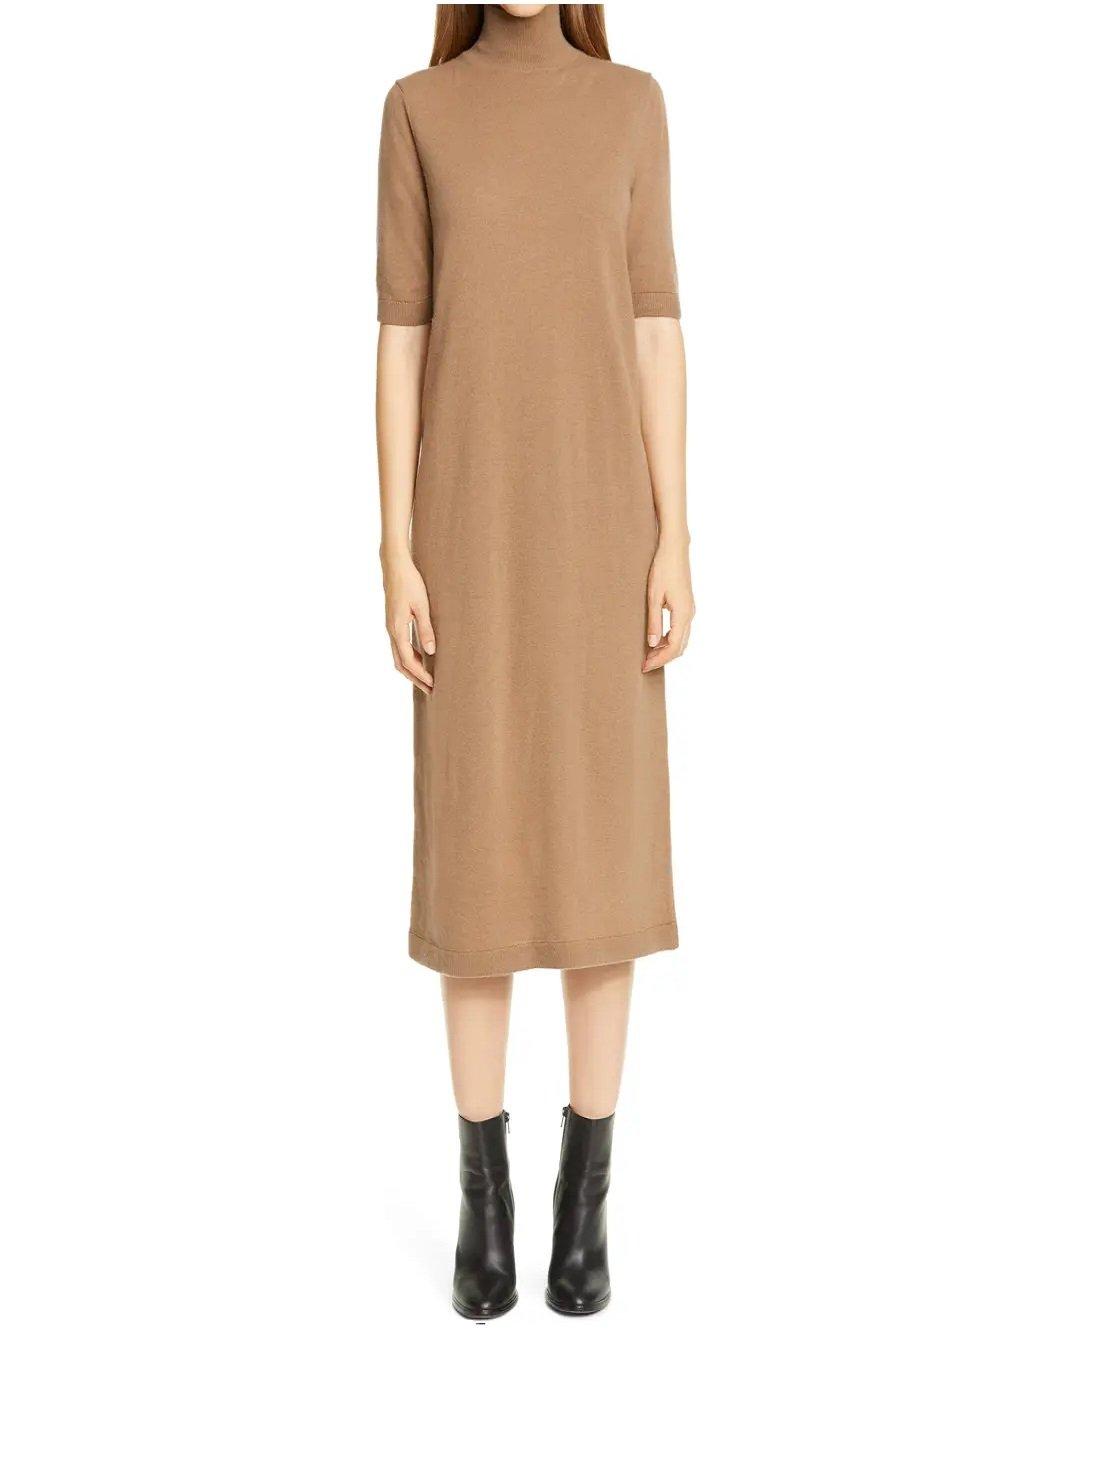 Turtleneck Wool & Cashmere Midi Sweater Dress